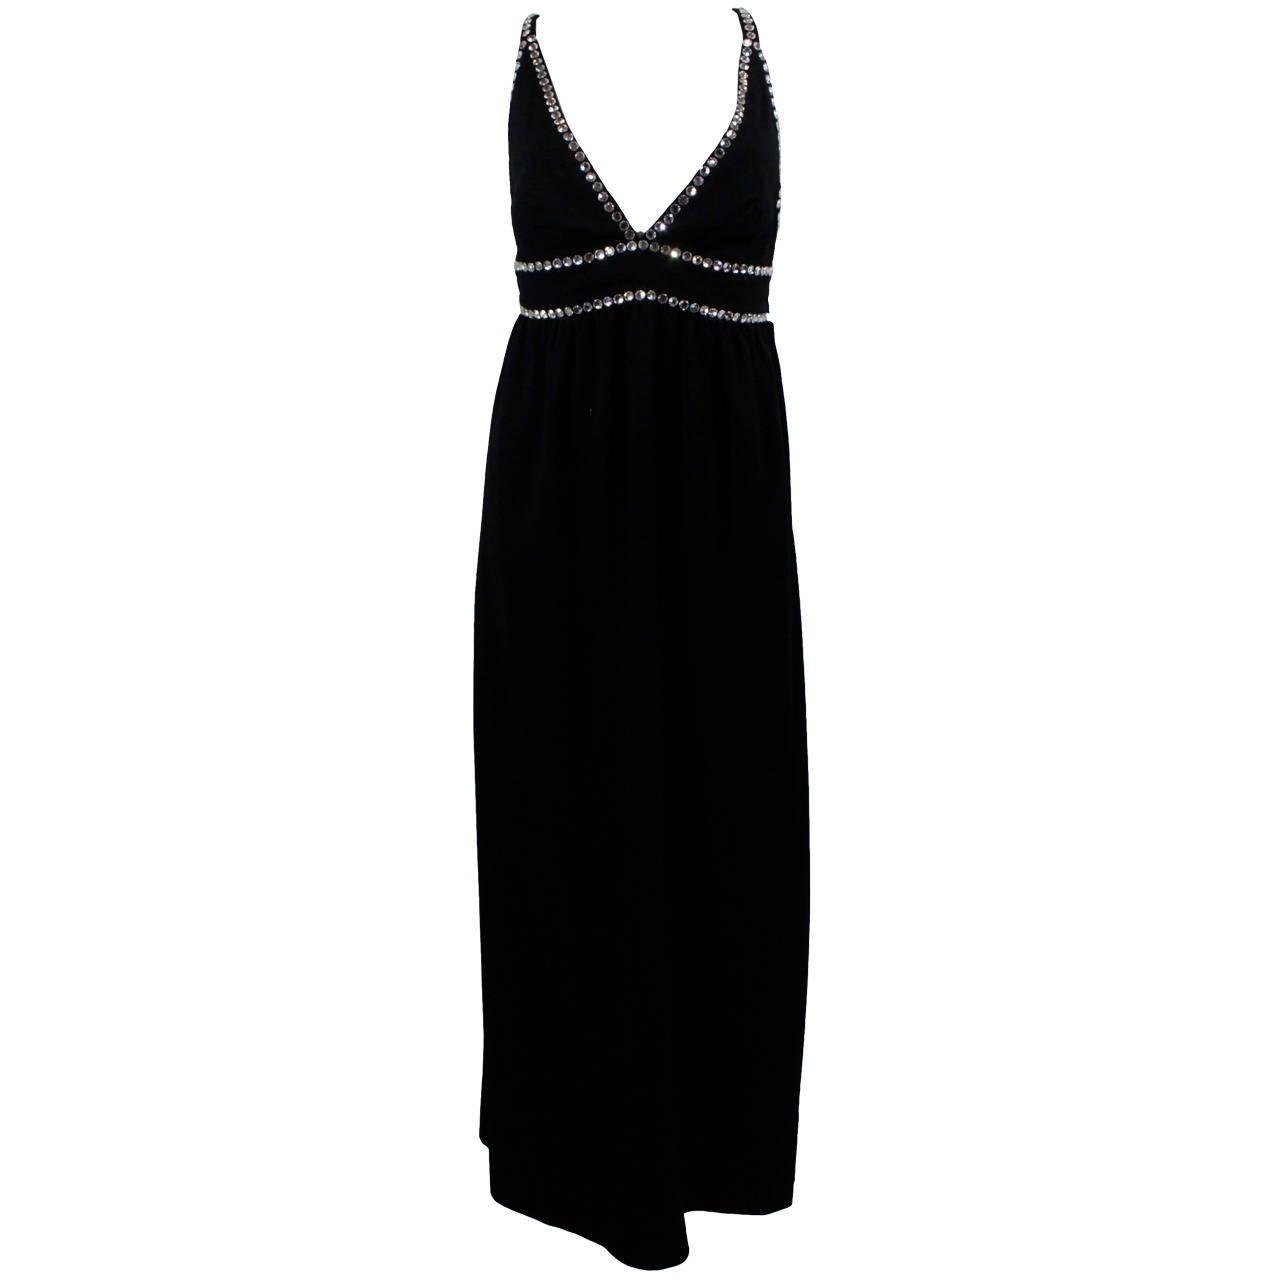 Oscar de La Renta Black Evening Gown with Oversize Rhinestone Embellishment 1